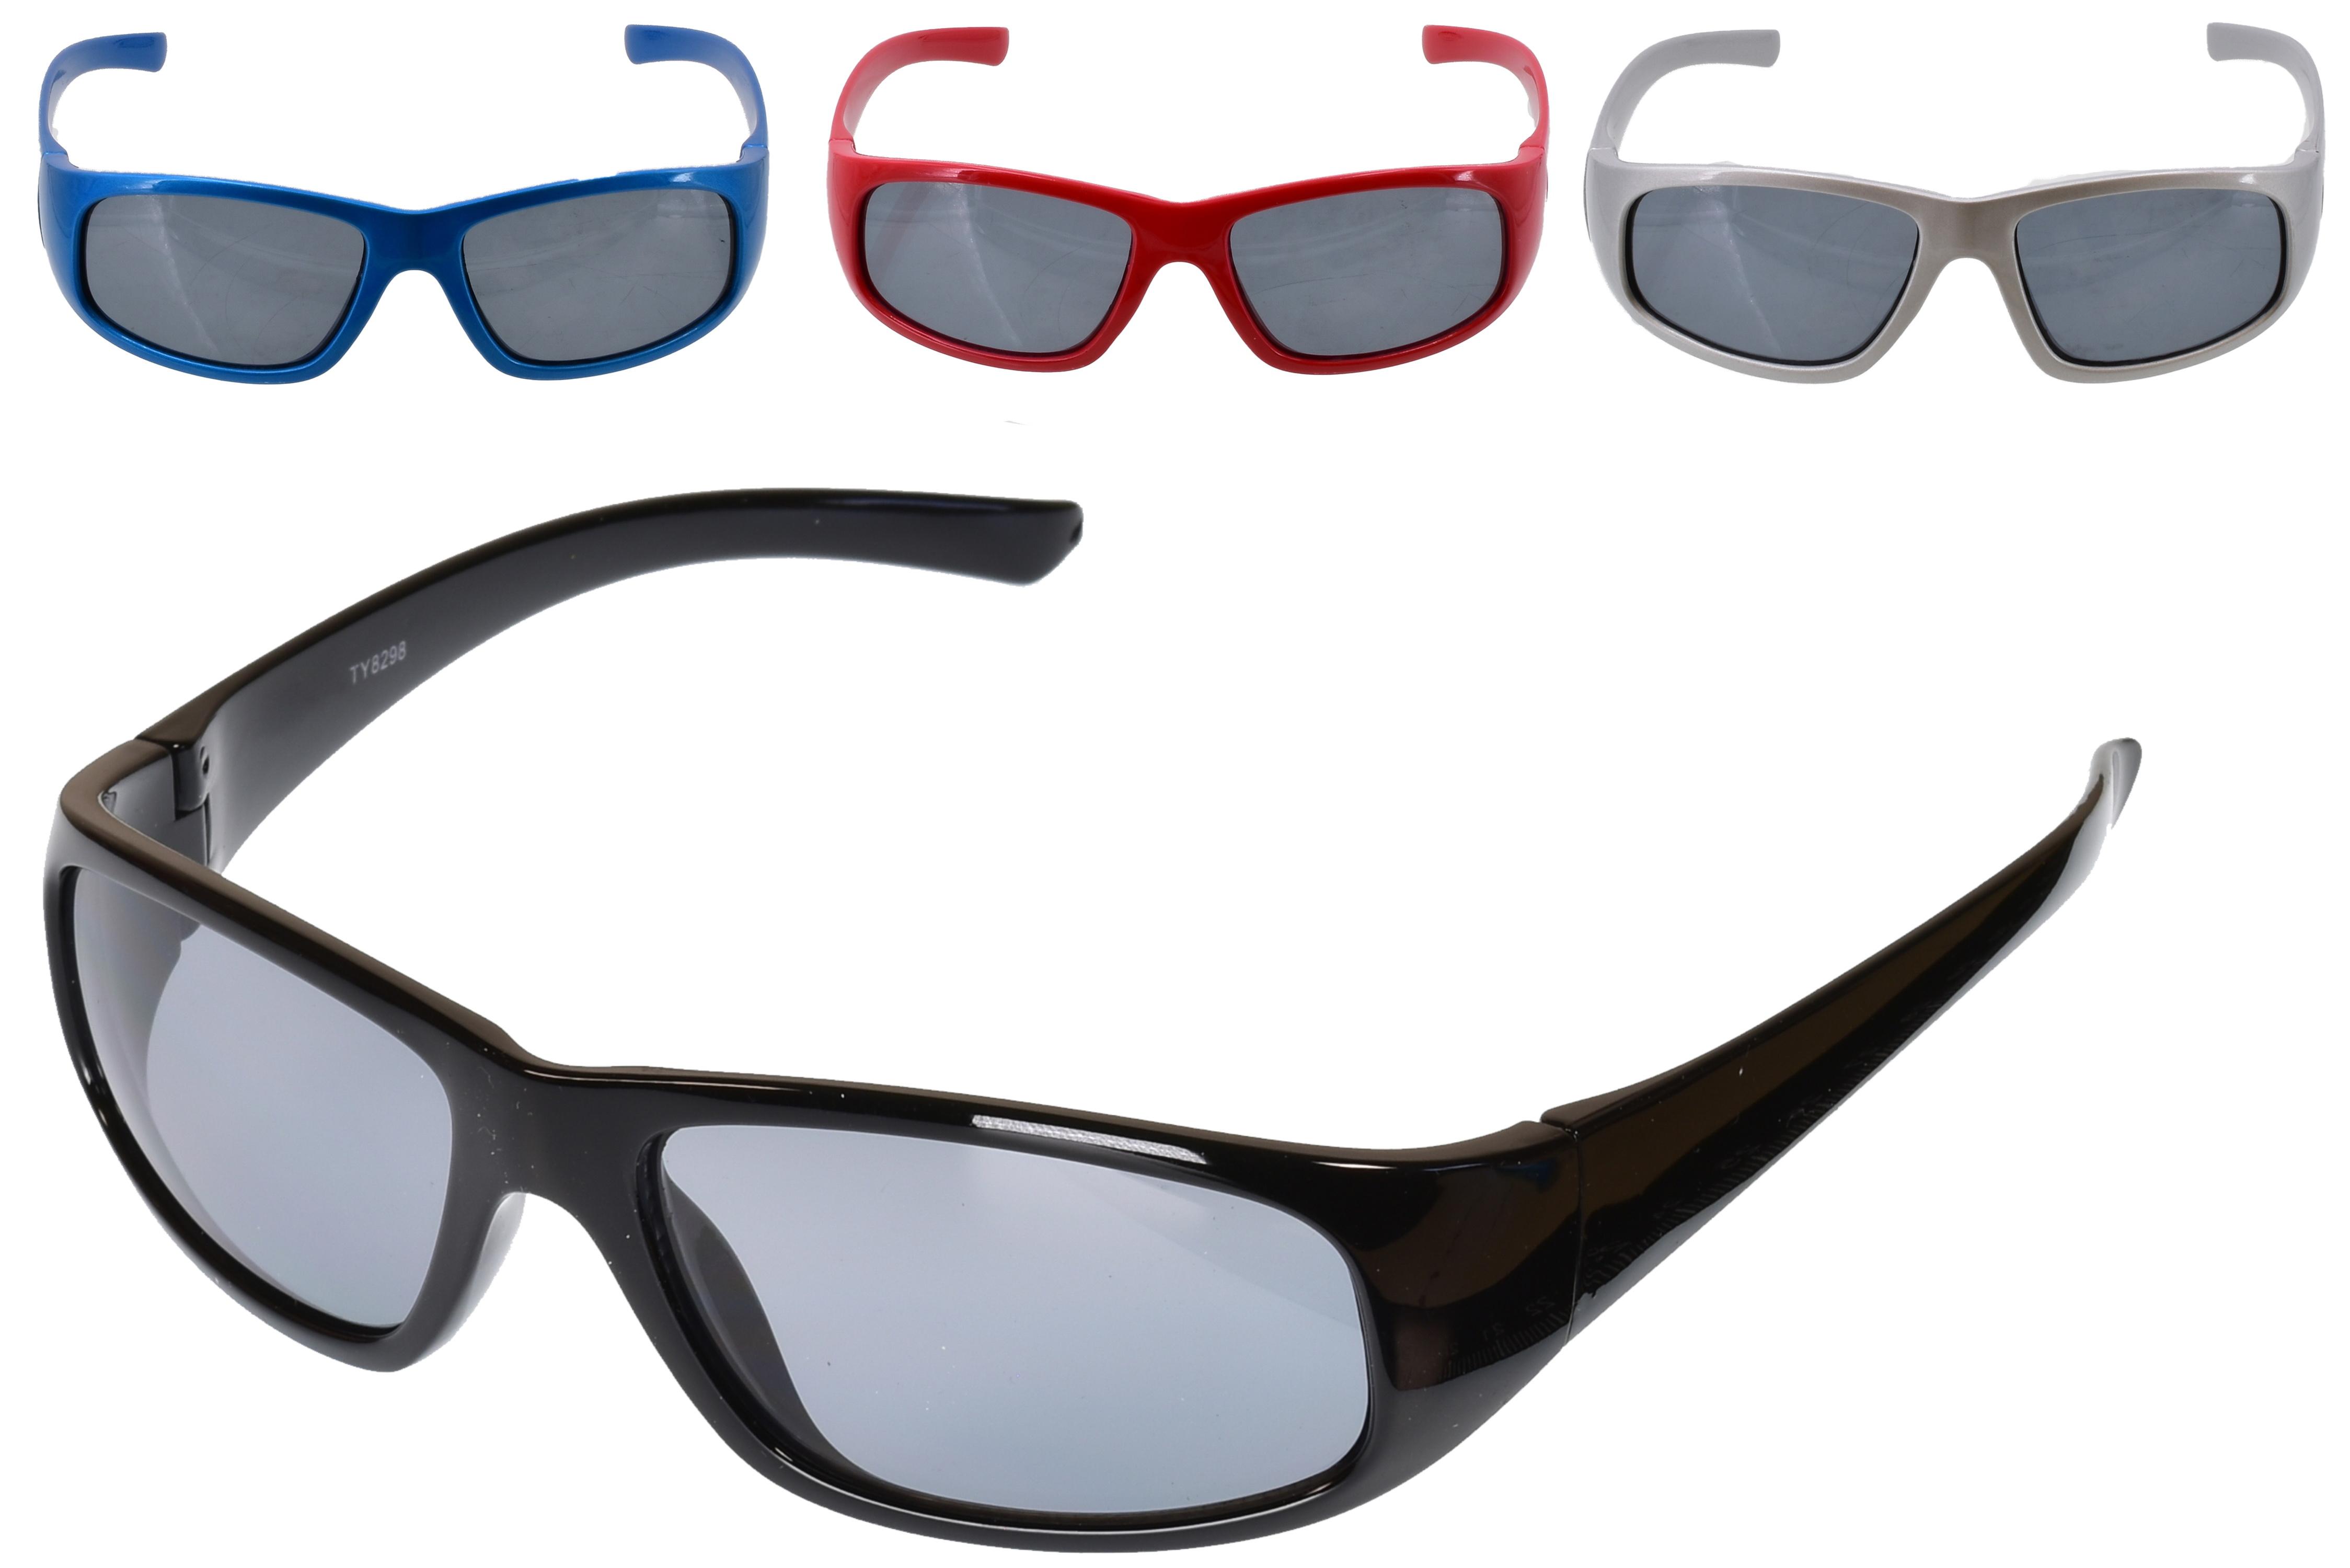 Kids Plastic Wrap Sunglasses - 4 Assorted